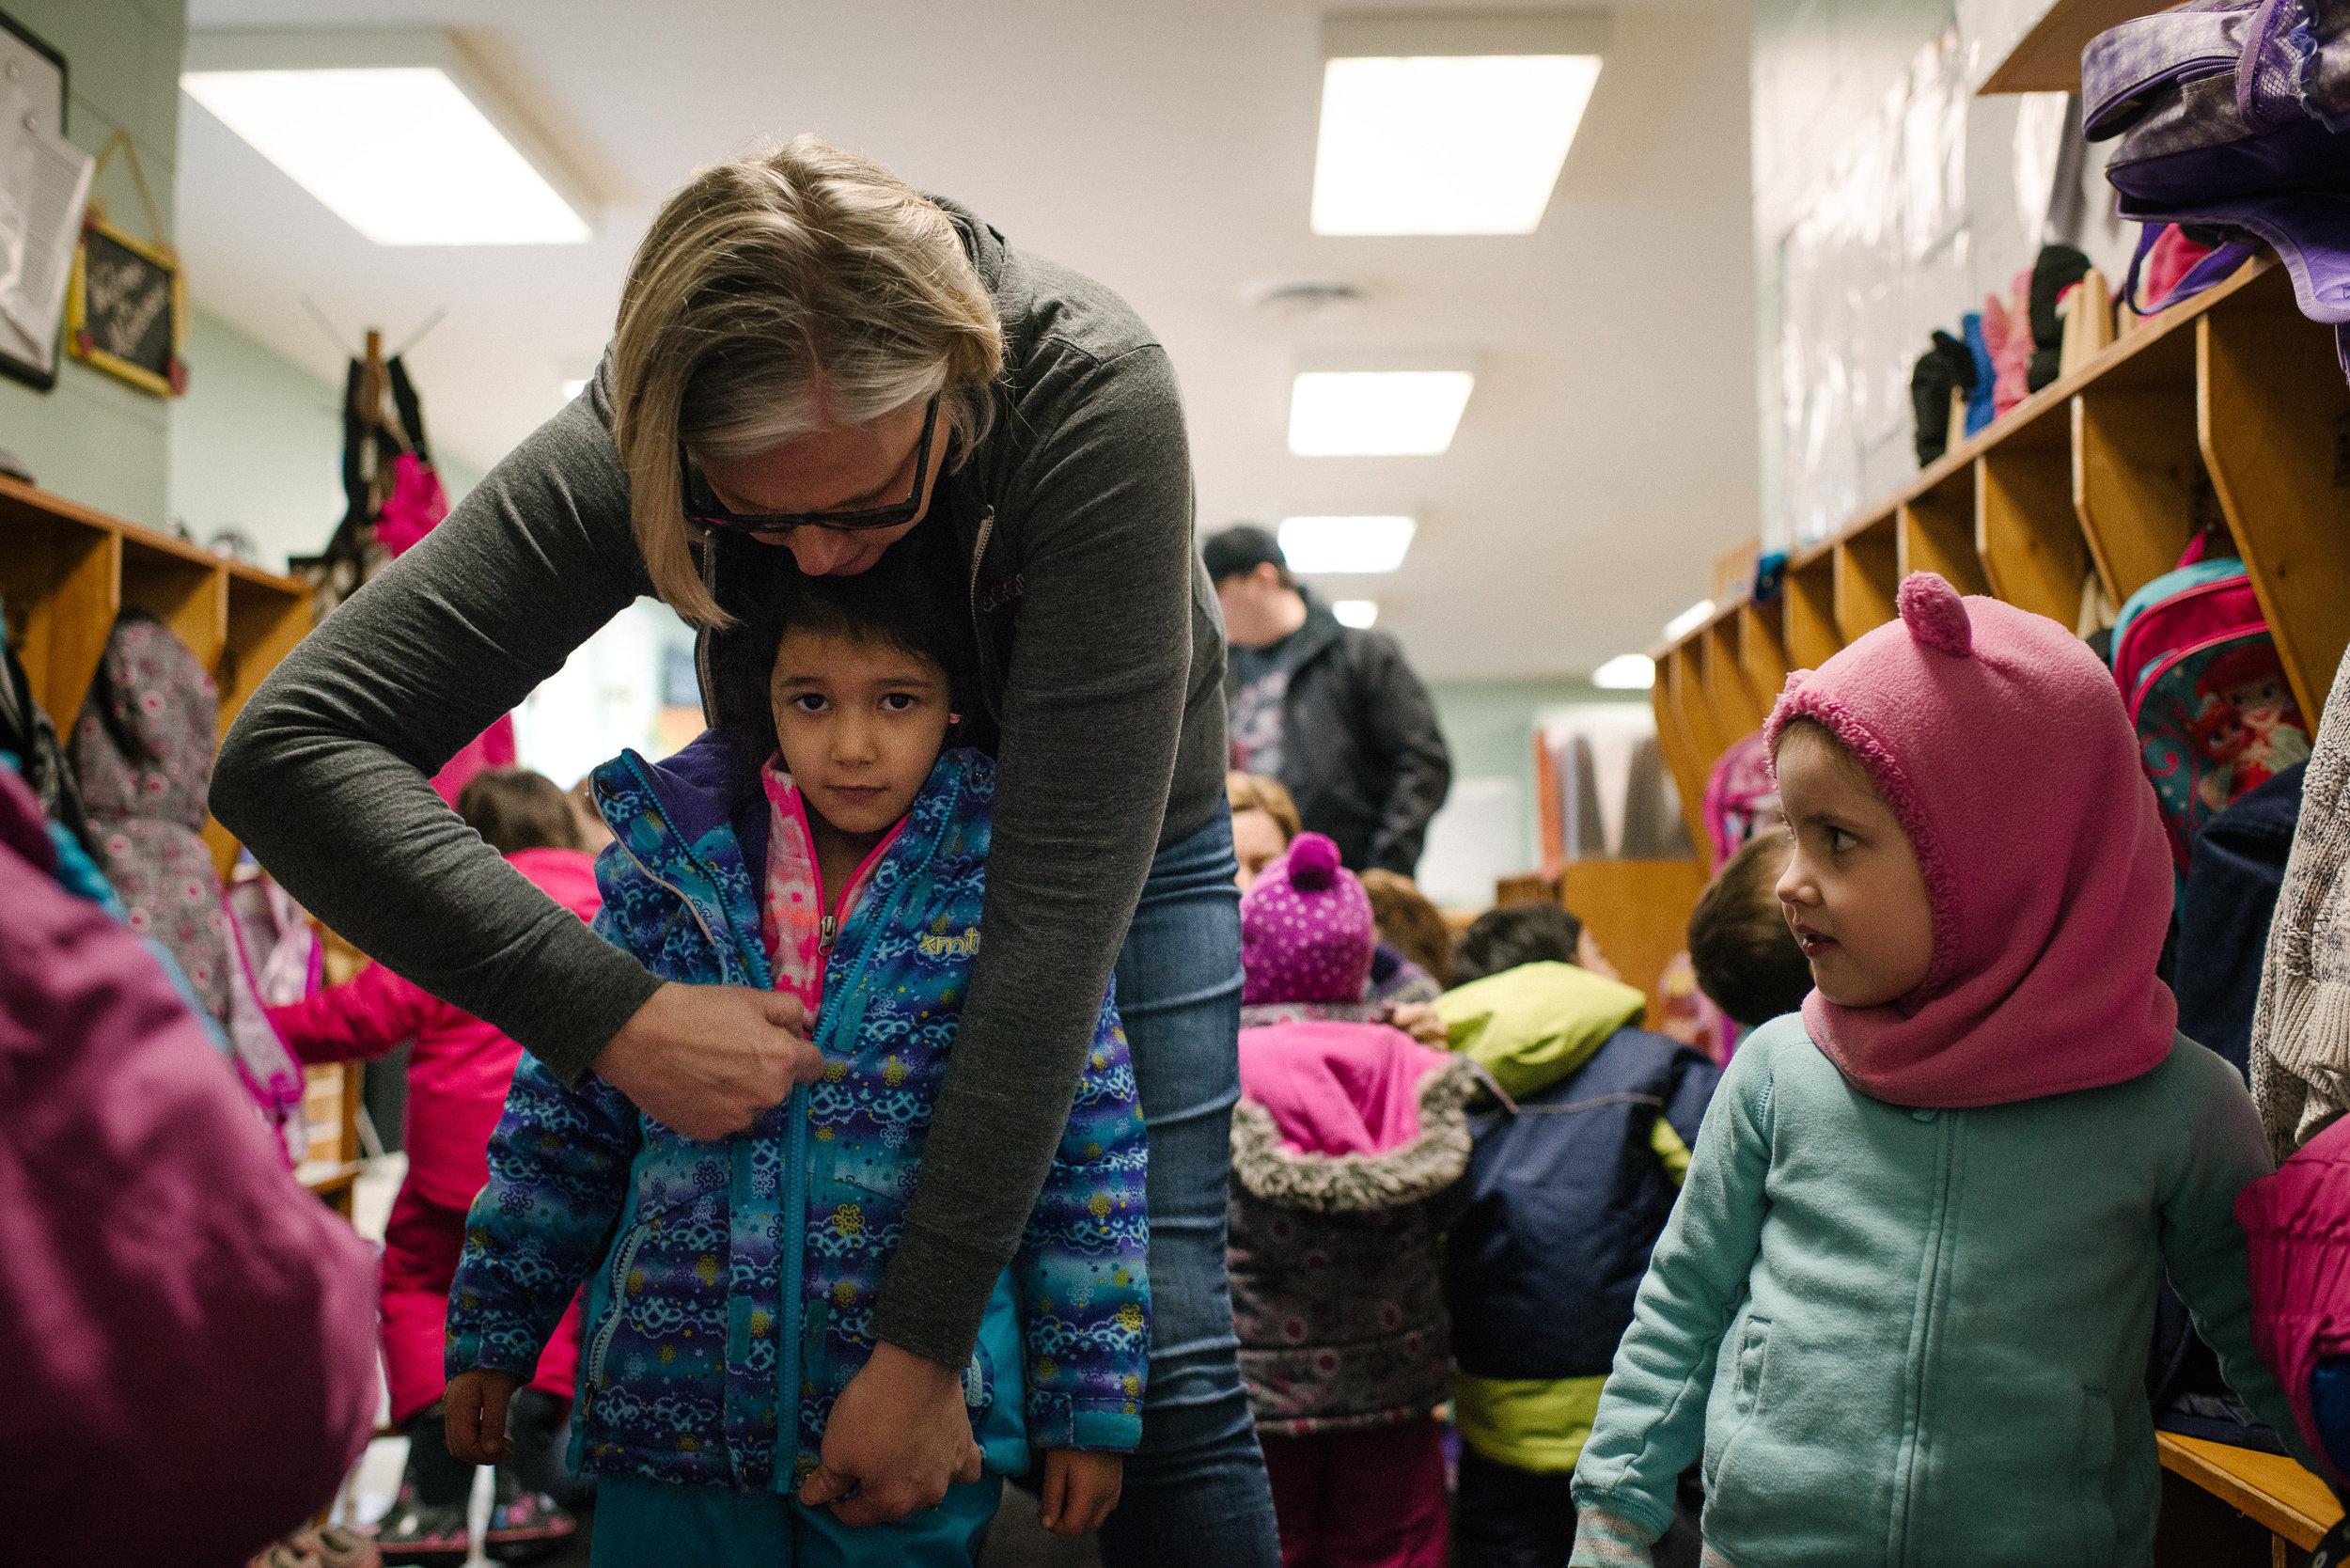 documentary school photography viara mileva kingston toronto ottawa-091111vm.jpg